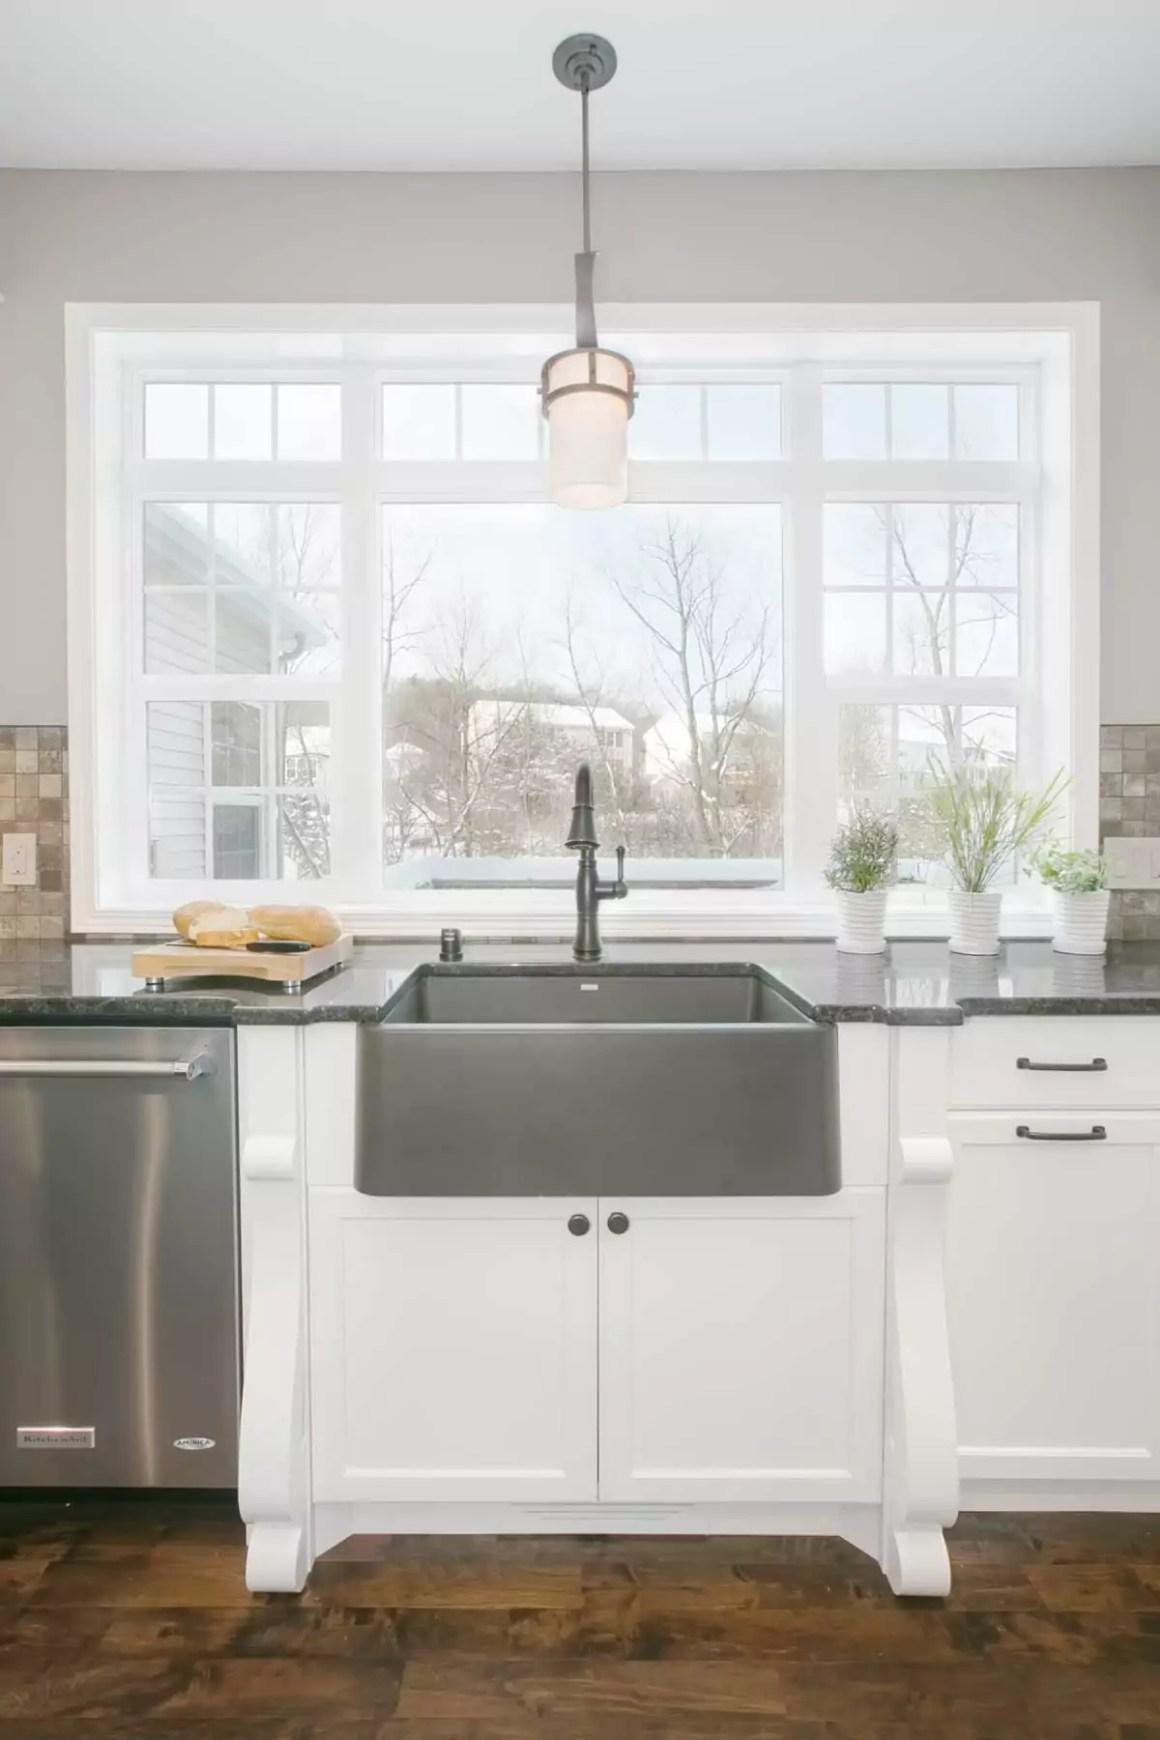 kitchen-remodeling-minneapolis - james barton design-build